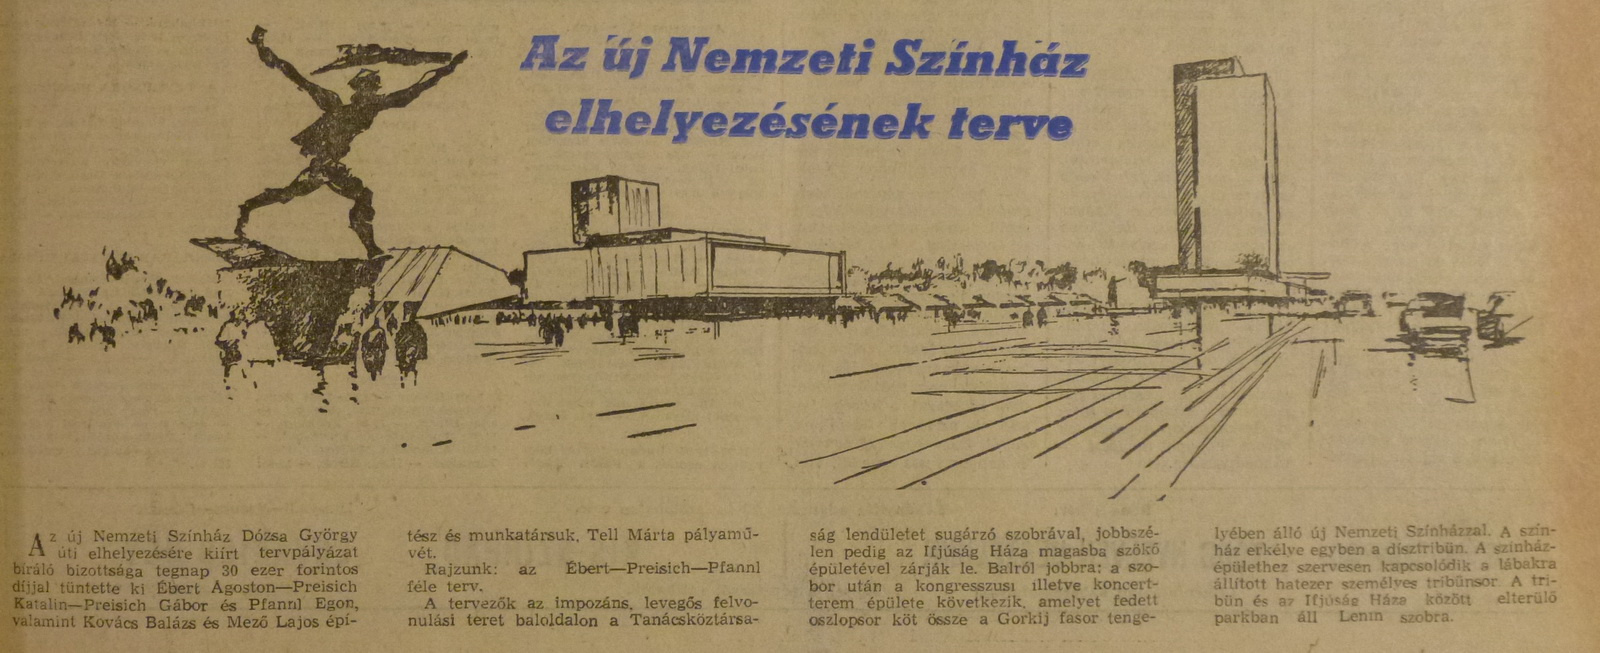 NemzetiSzinhaz-19640828-EstiHirlap